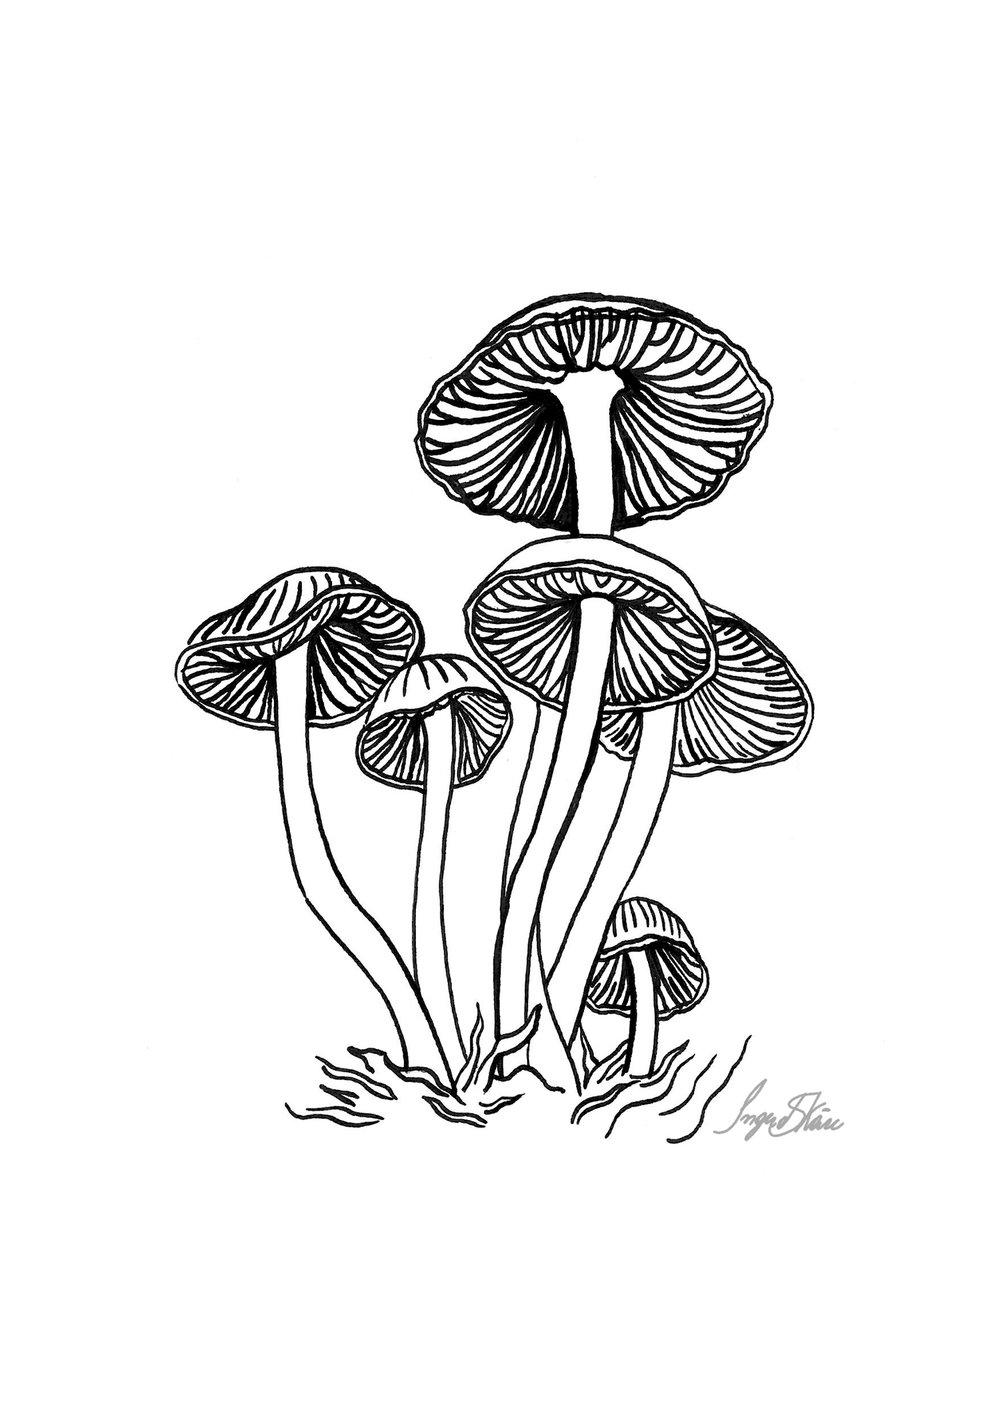 inktober-mushrooms-hatching.jpg